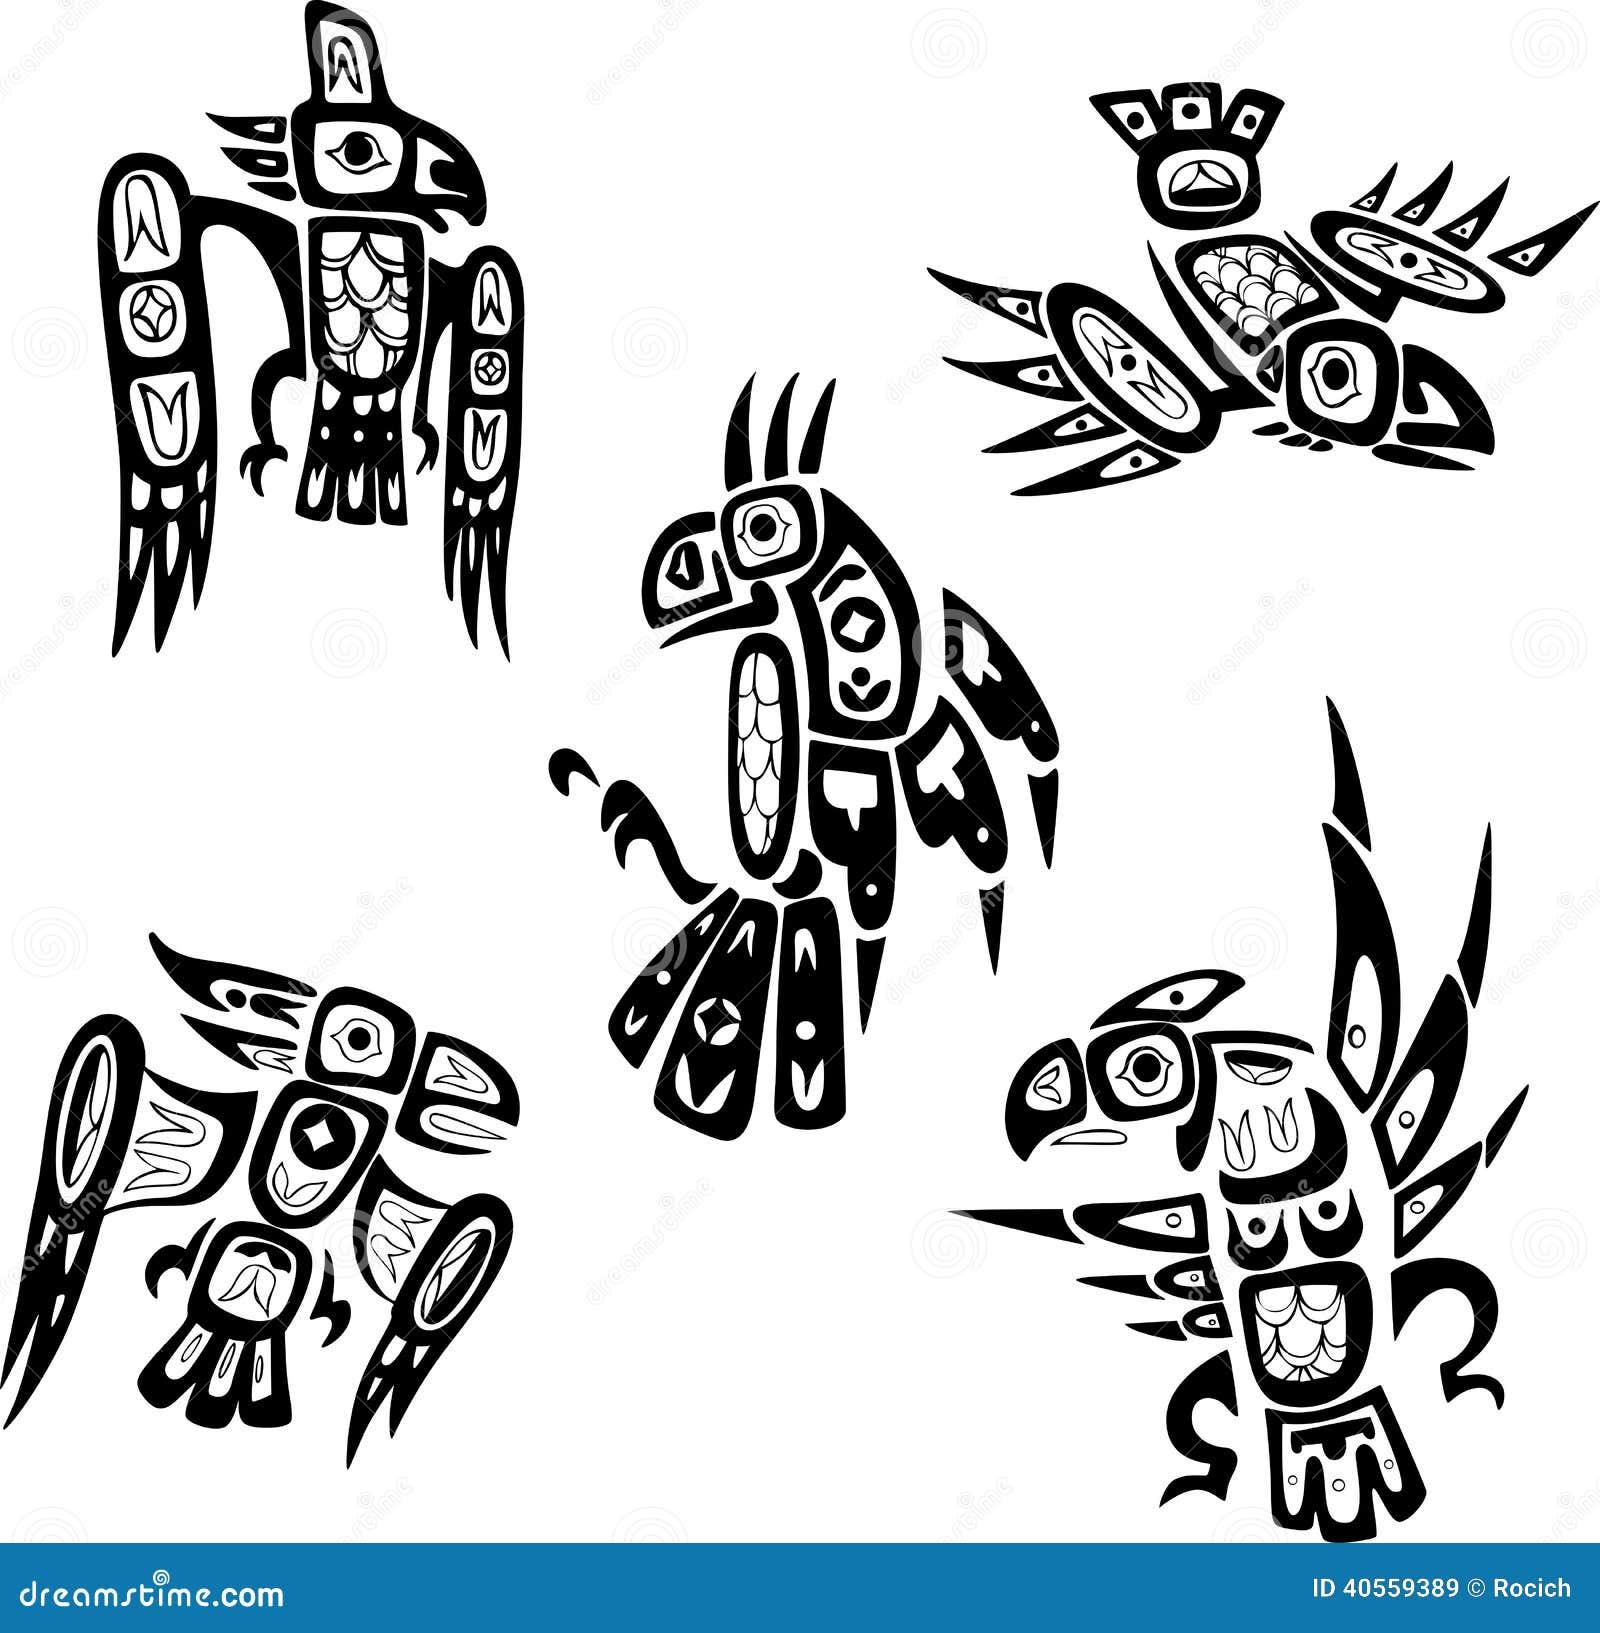 disegni tribali di shoshoni indiane indigene uccelli tomahawk missile clipart tomahawk missile clipart